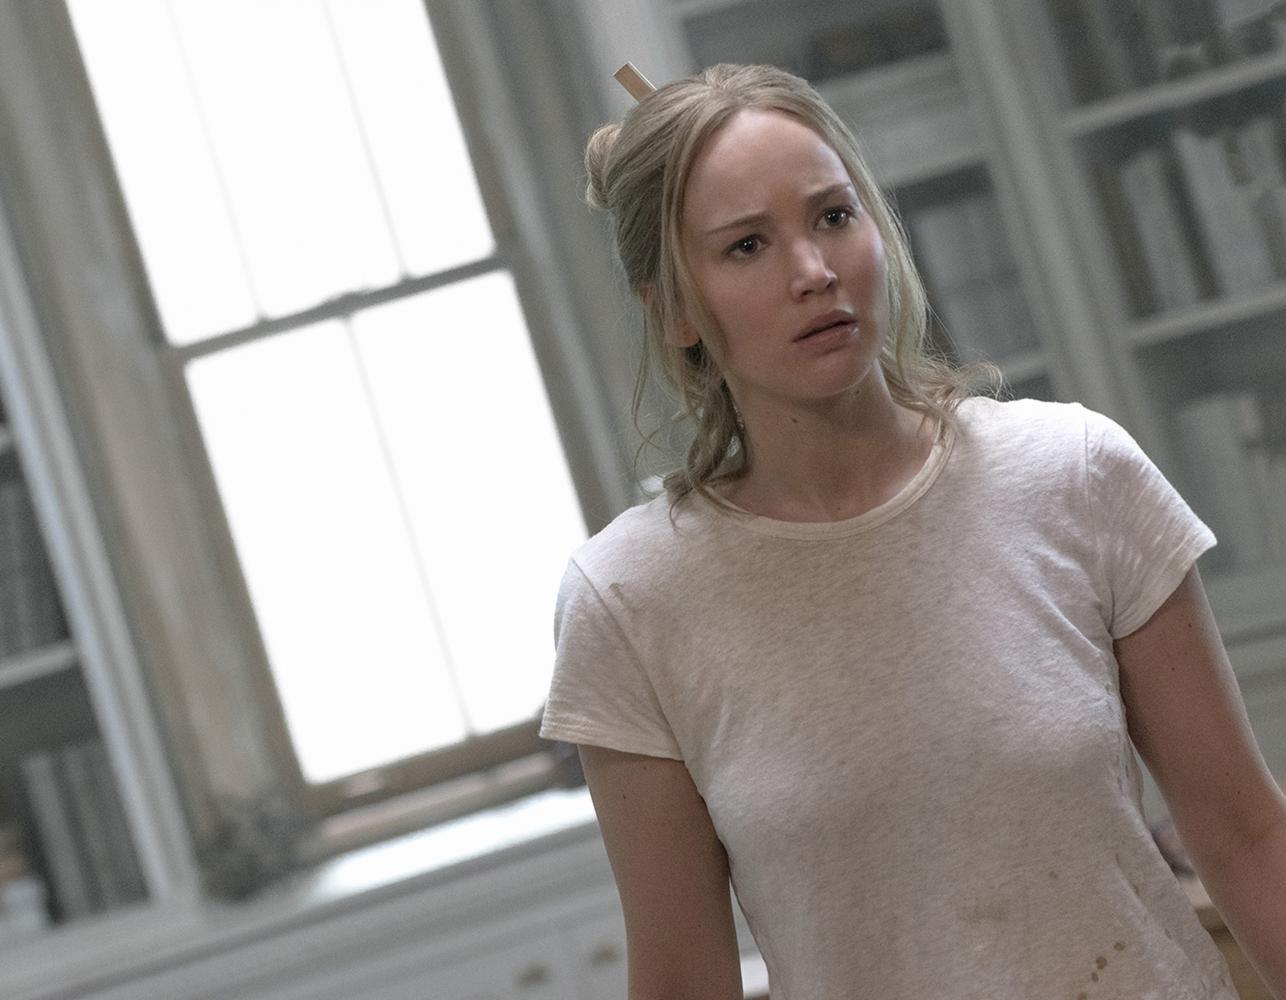 Jennifer Lawrence stars in the new psychological horror film